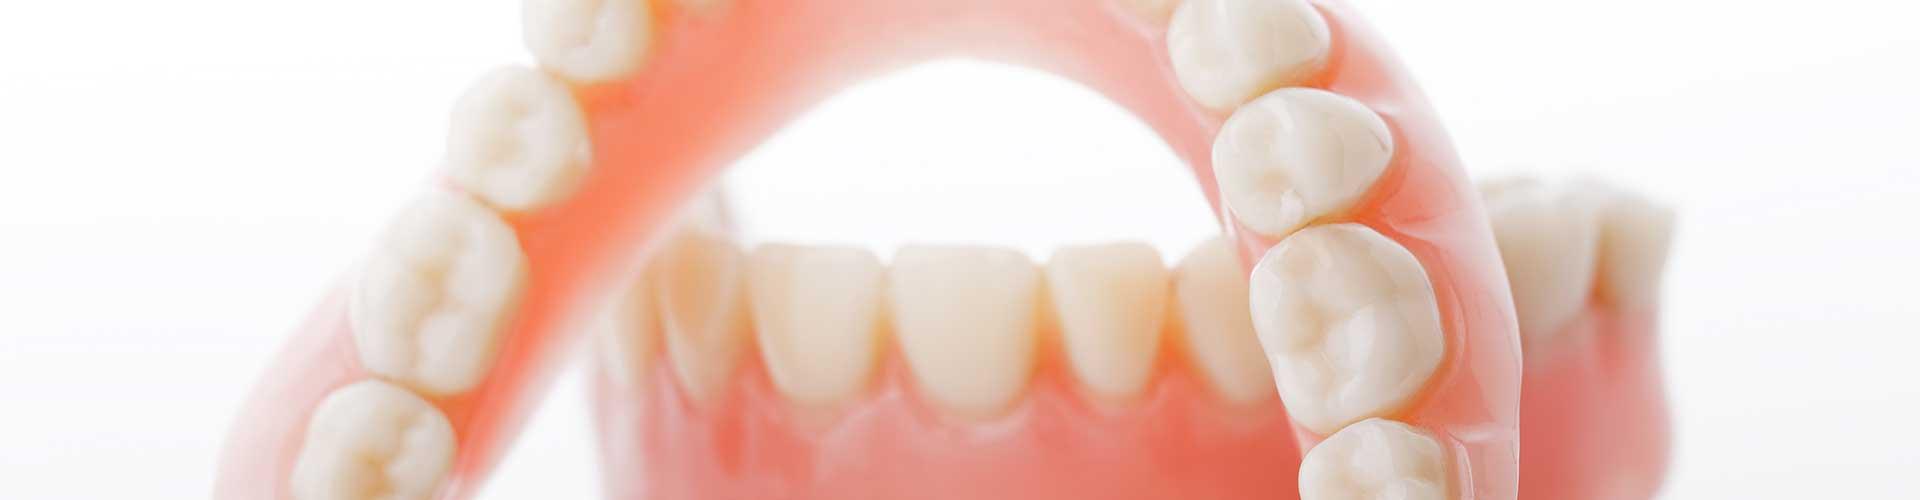 Dentures | Tooth Suite Family Dentistry | General Dentist | Lloydminster